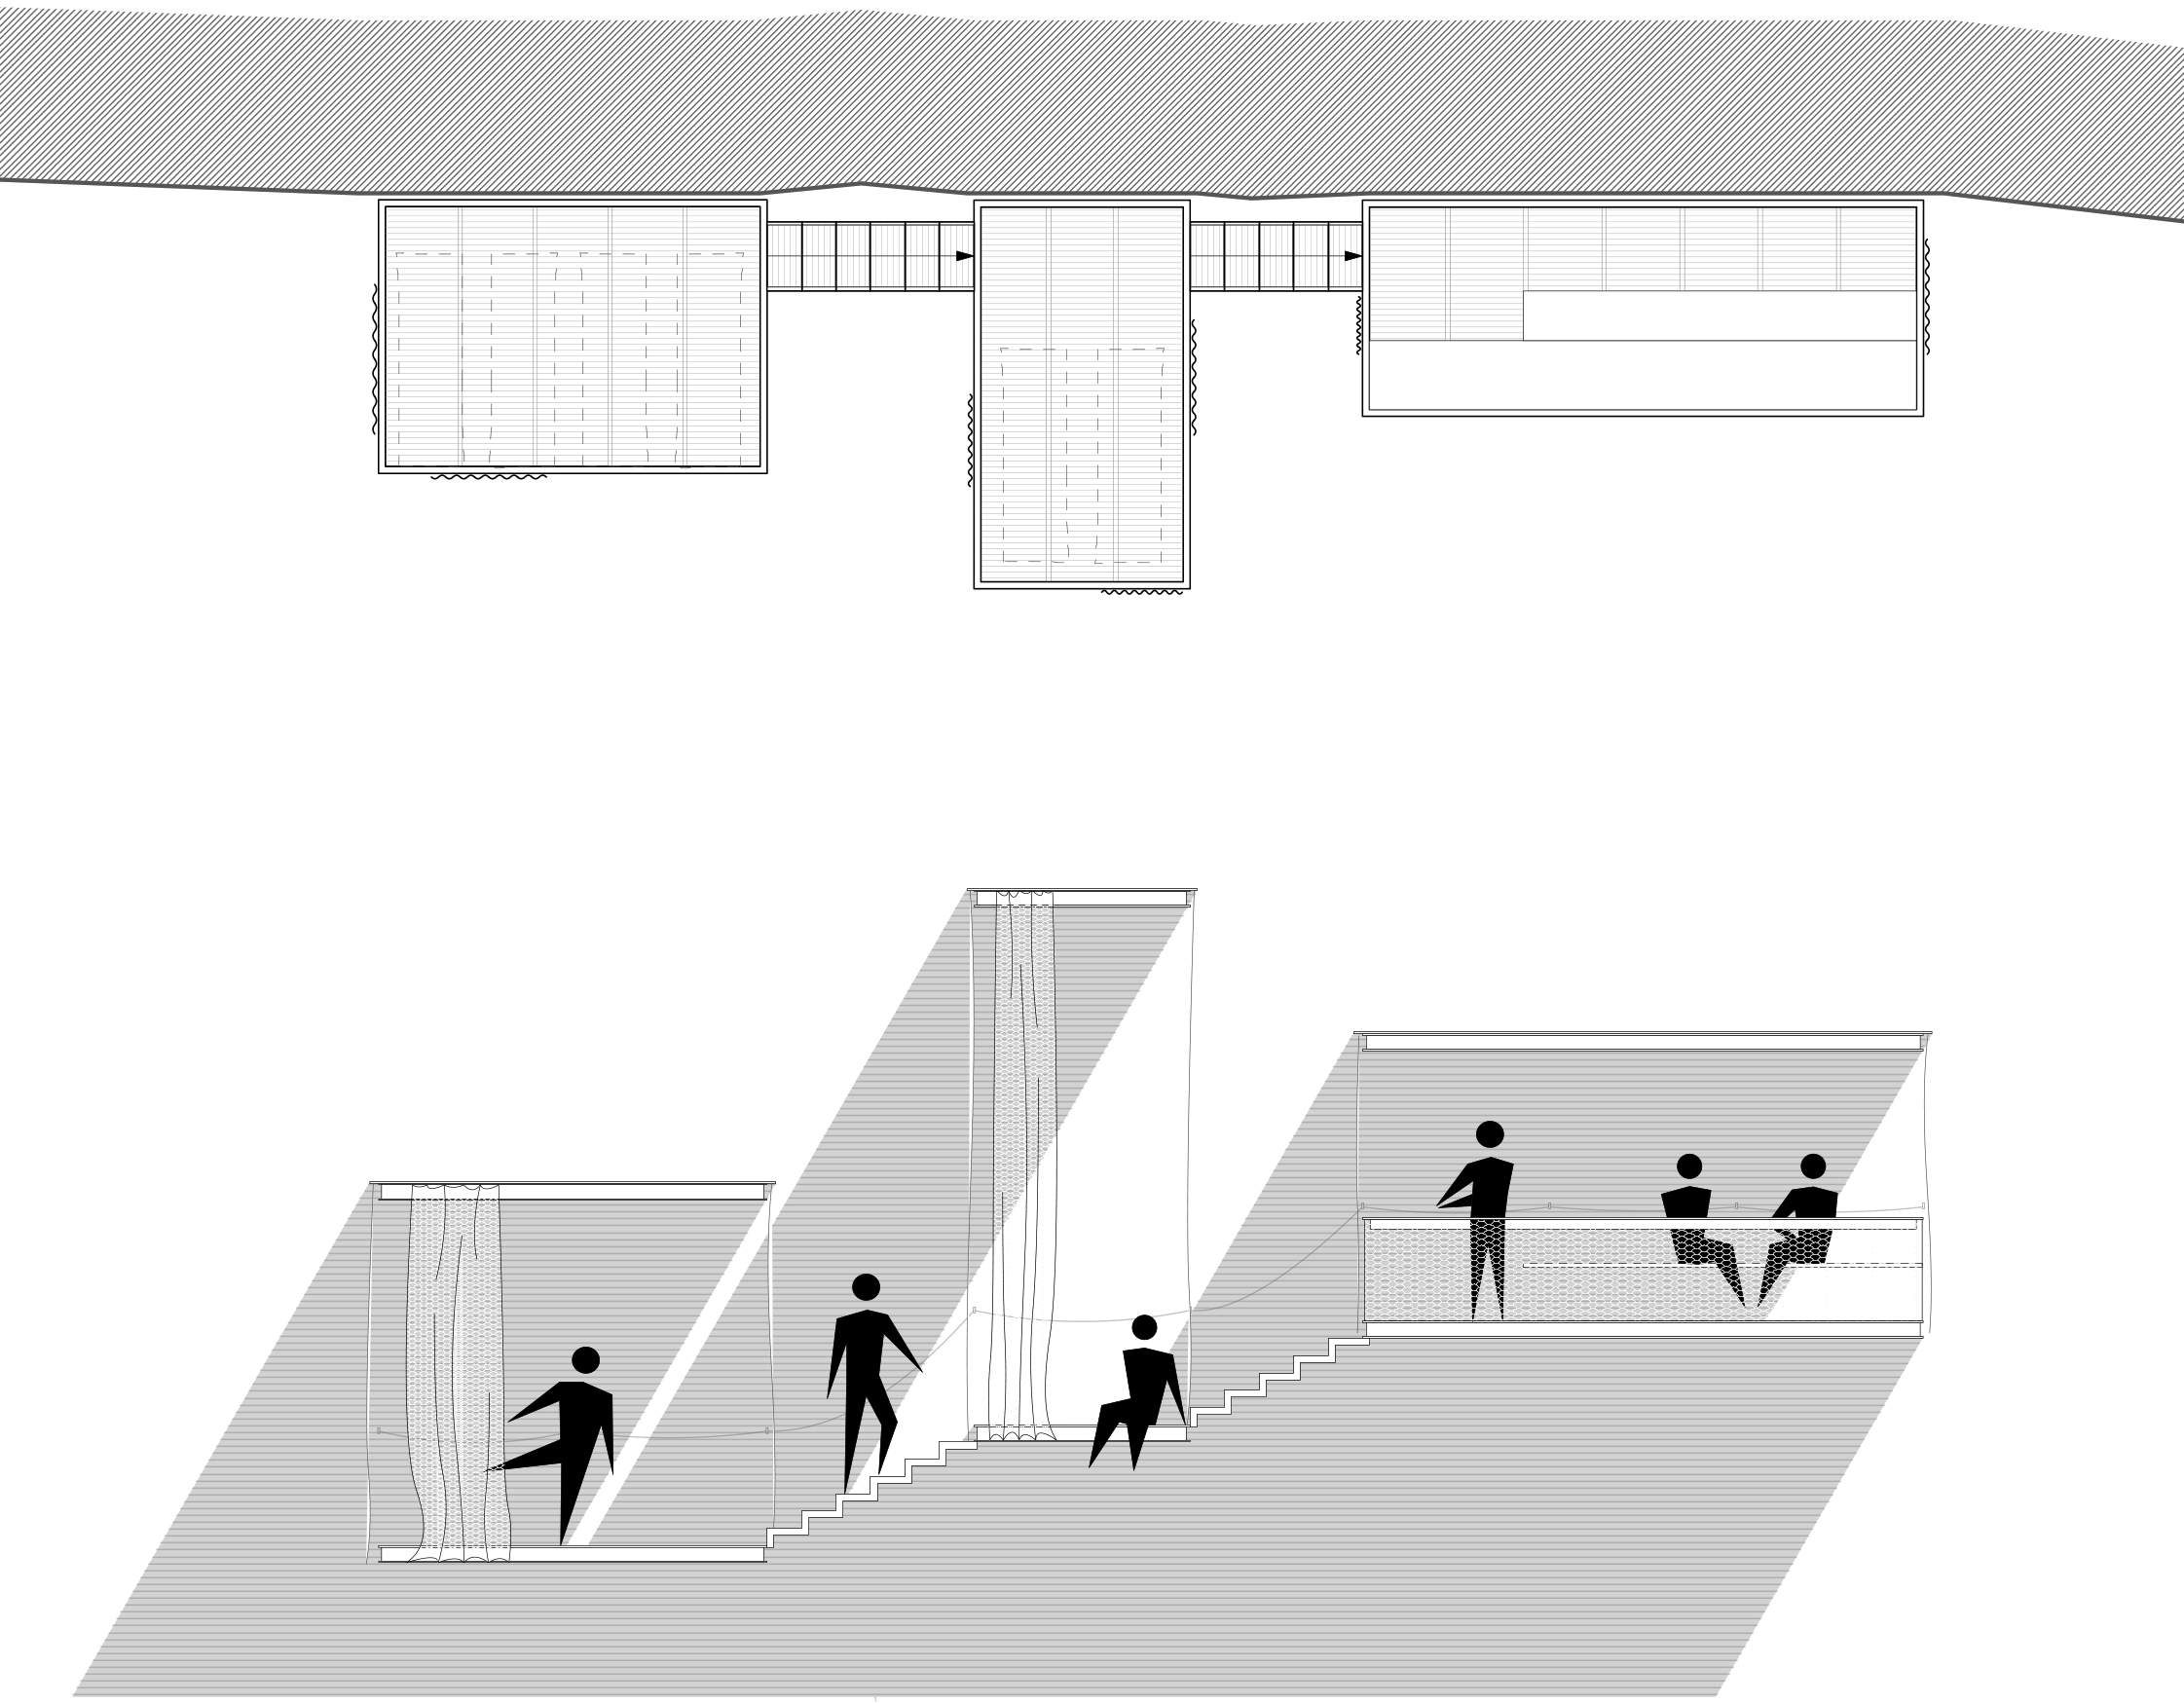 christophe-benichou-architectures-balcons-verdon-balconies-plan